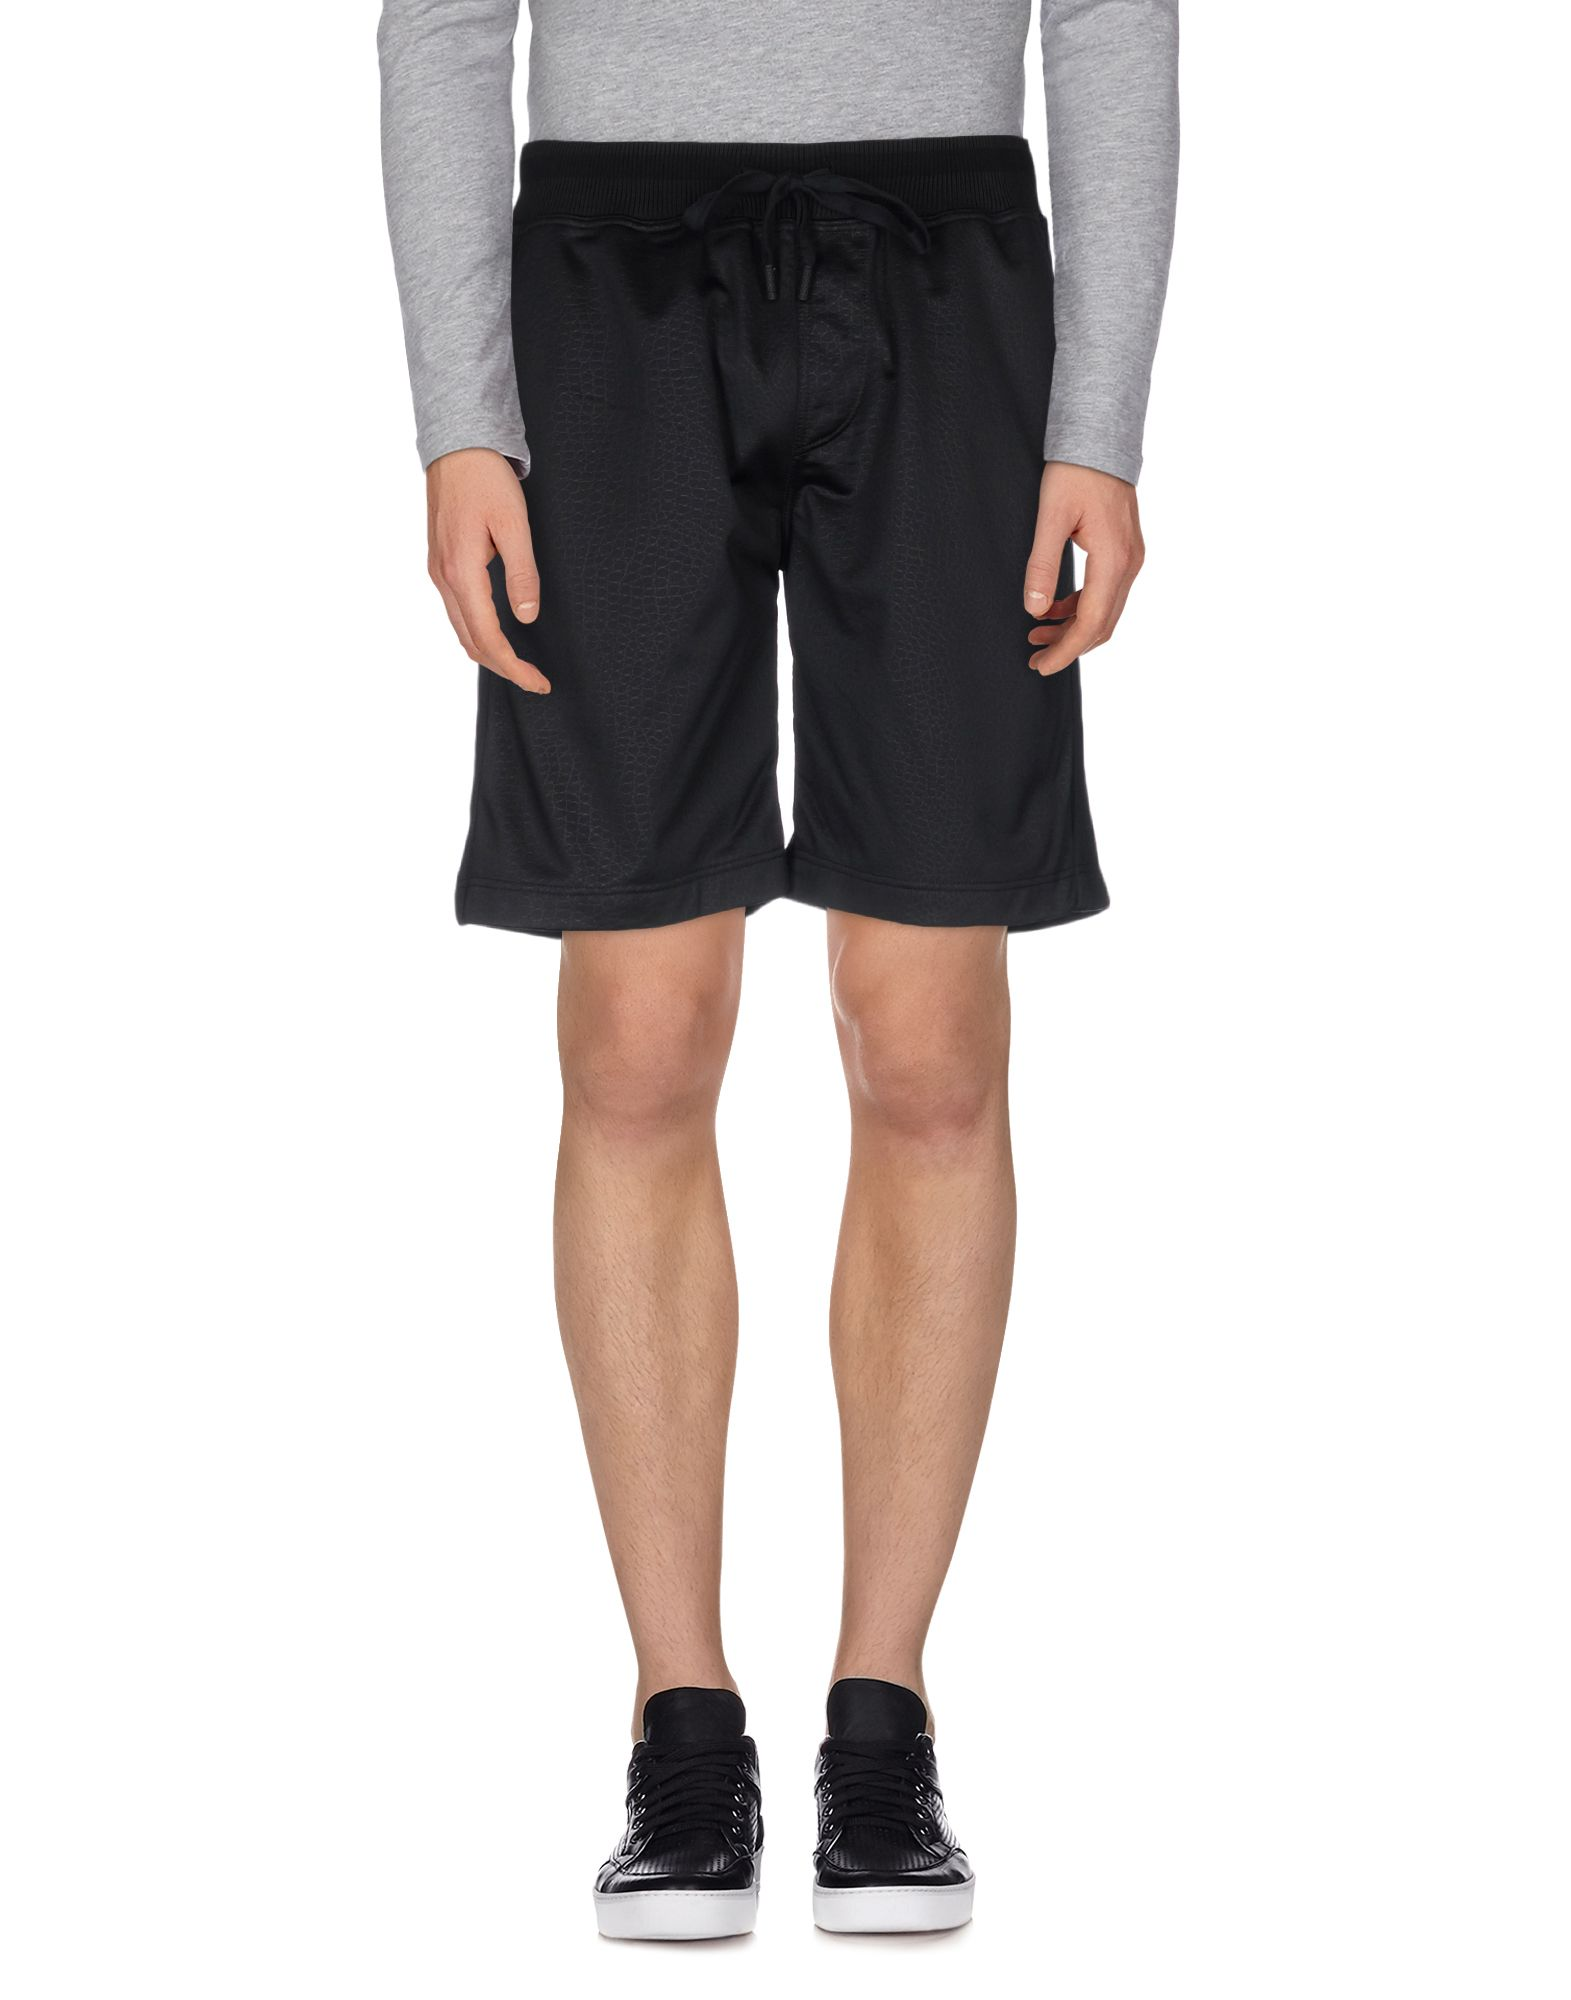 Pantalone Felpa Roberto Cavalli Gym Donna - Acquista online su